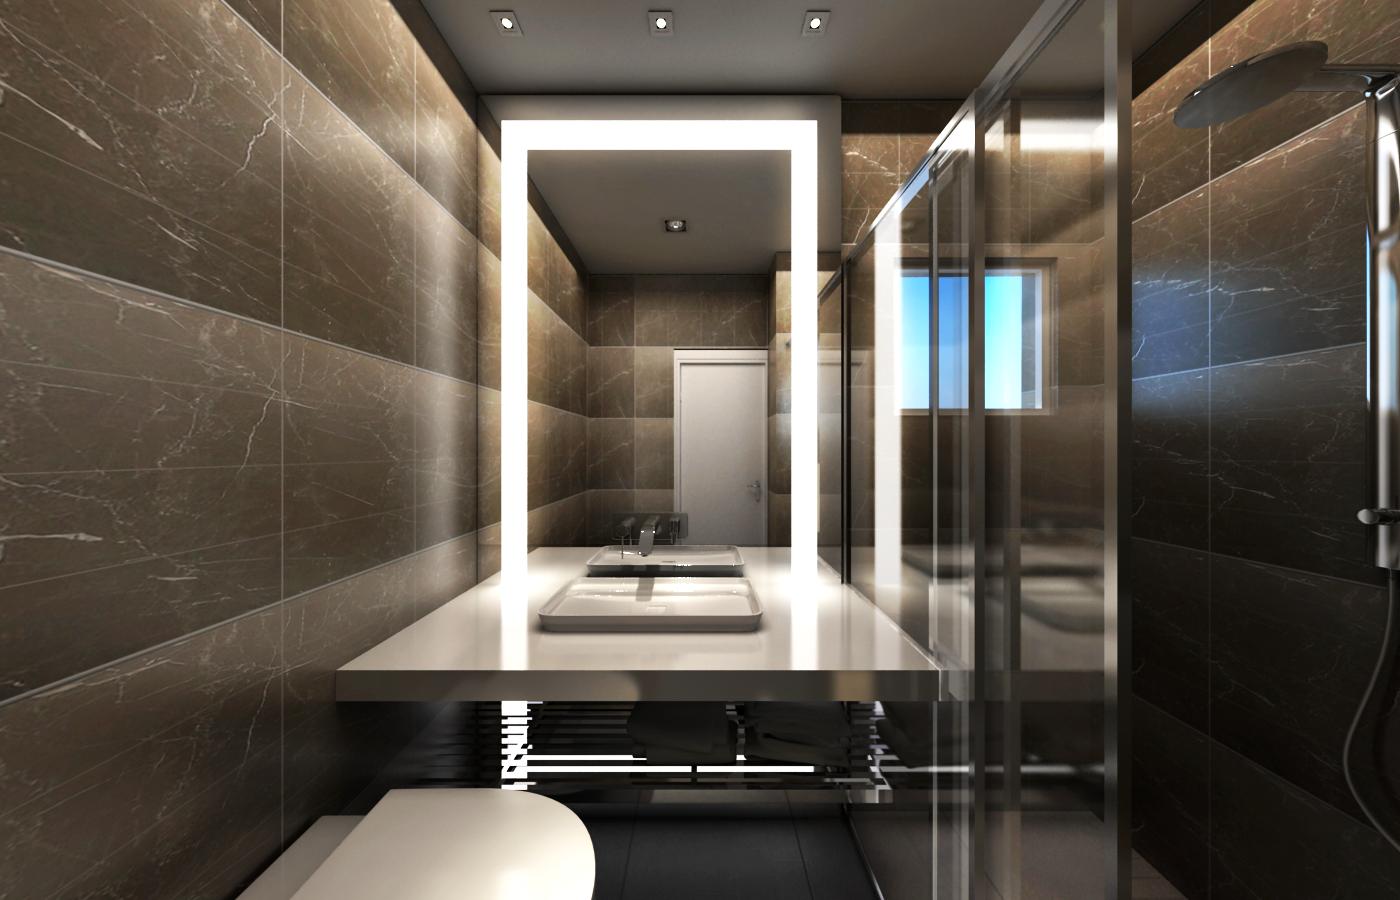 PTG_Felipe Saia Arquitetura - Render Banheiro Suite 03.png